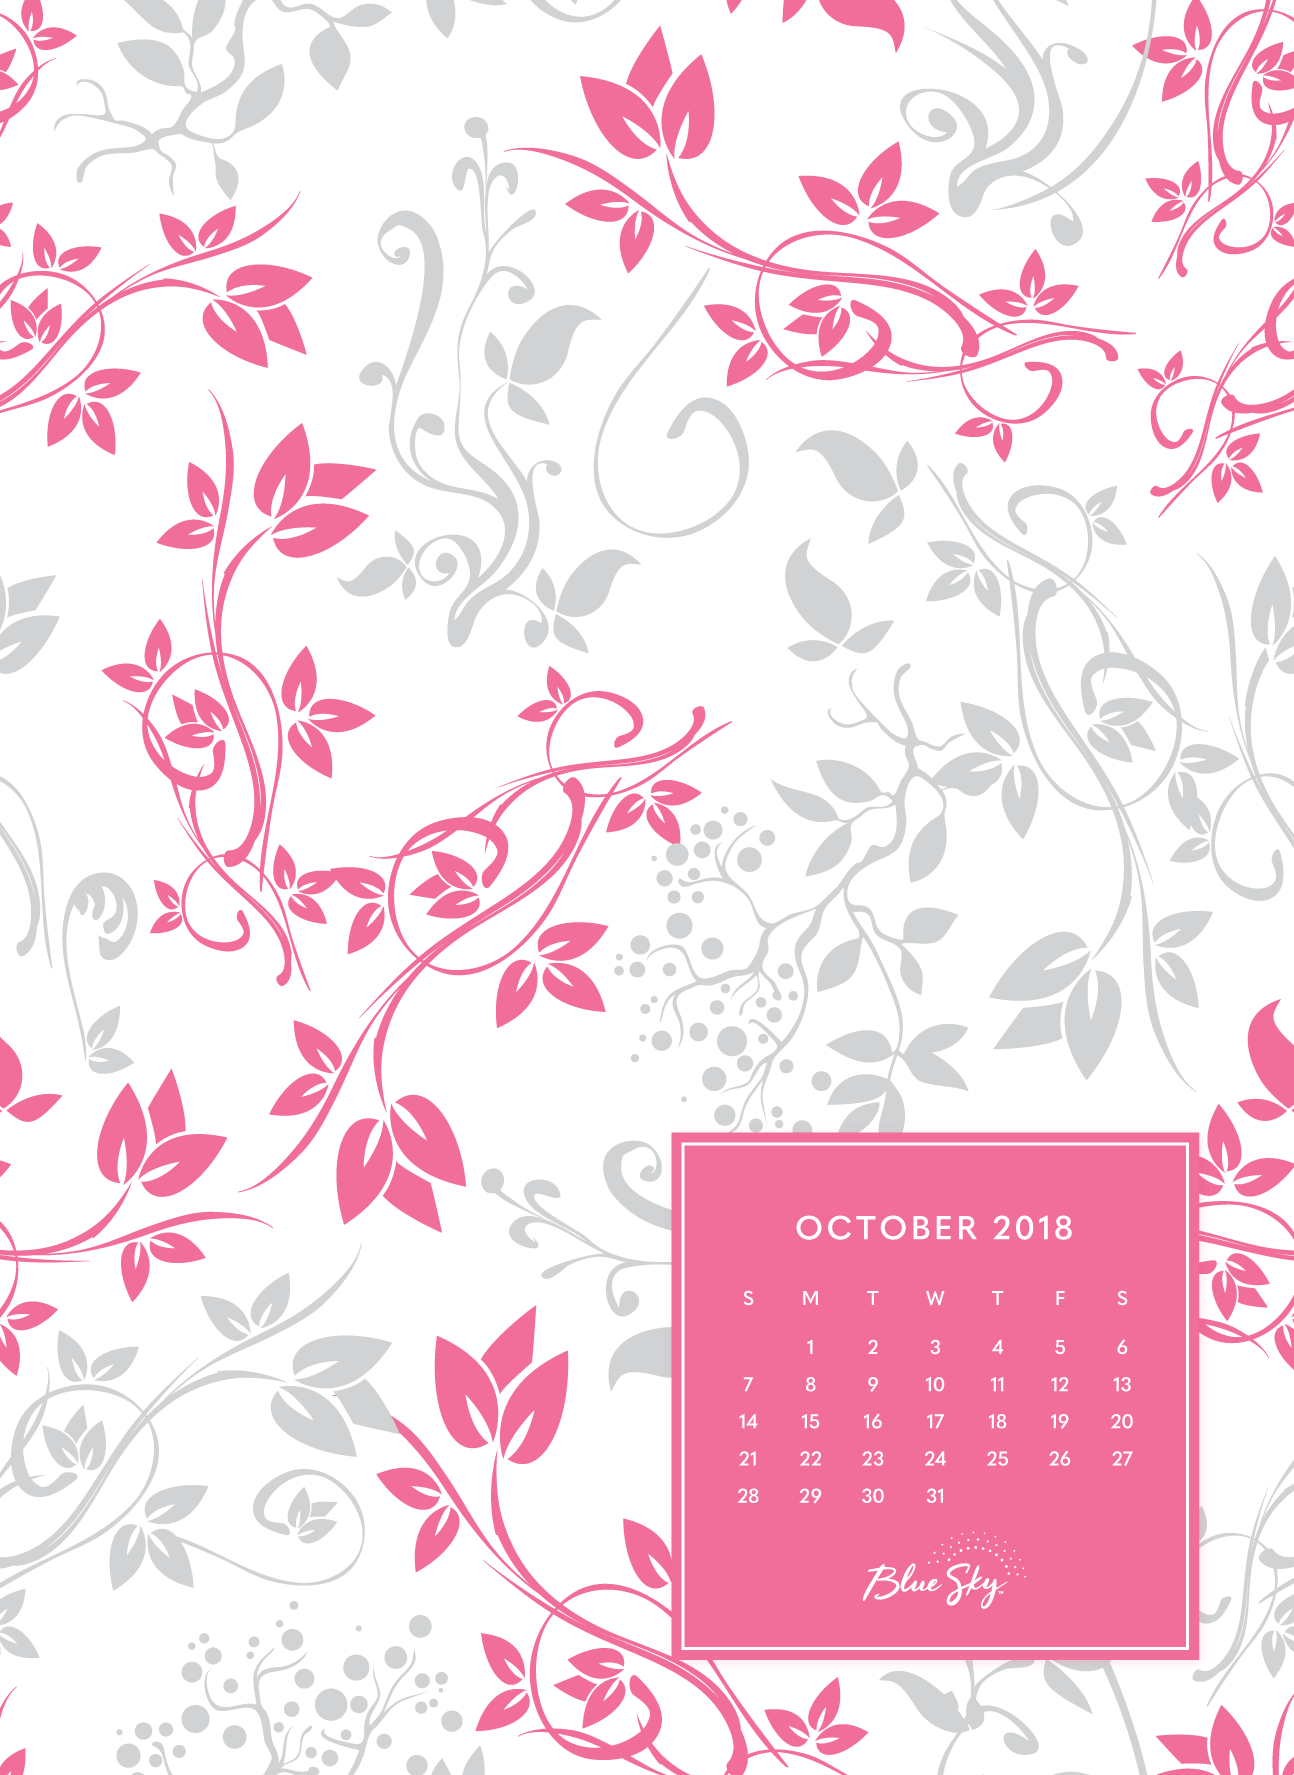 40+] October 2019 Calendar Wallpapers